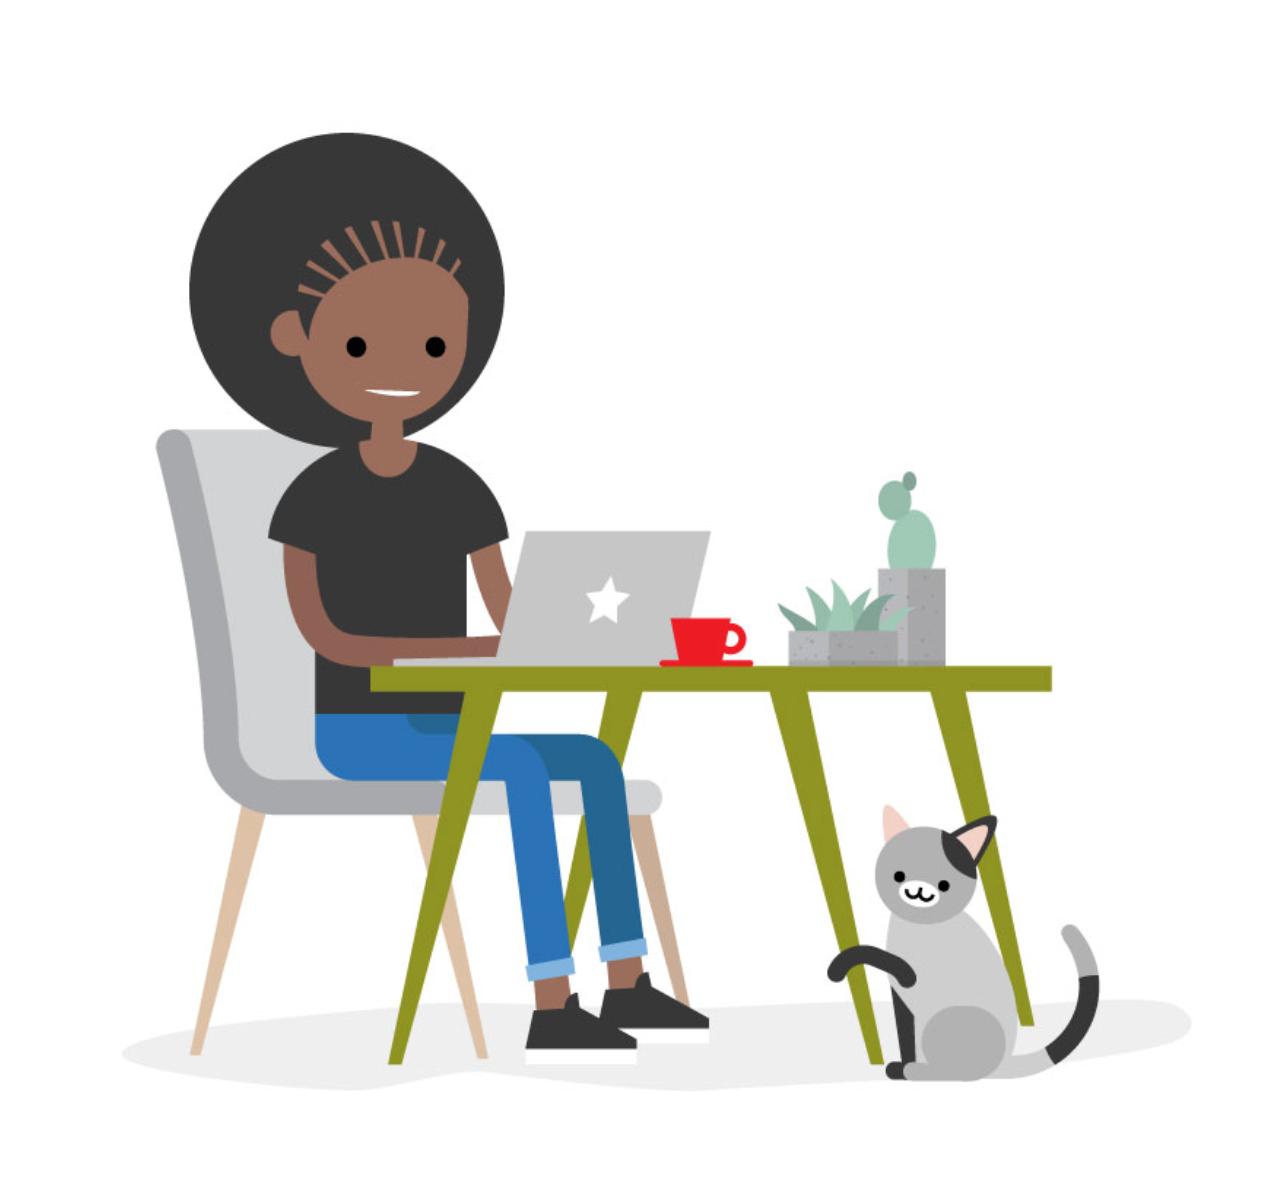 Cartoon image of someone sat at a computer